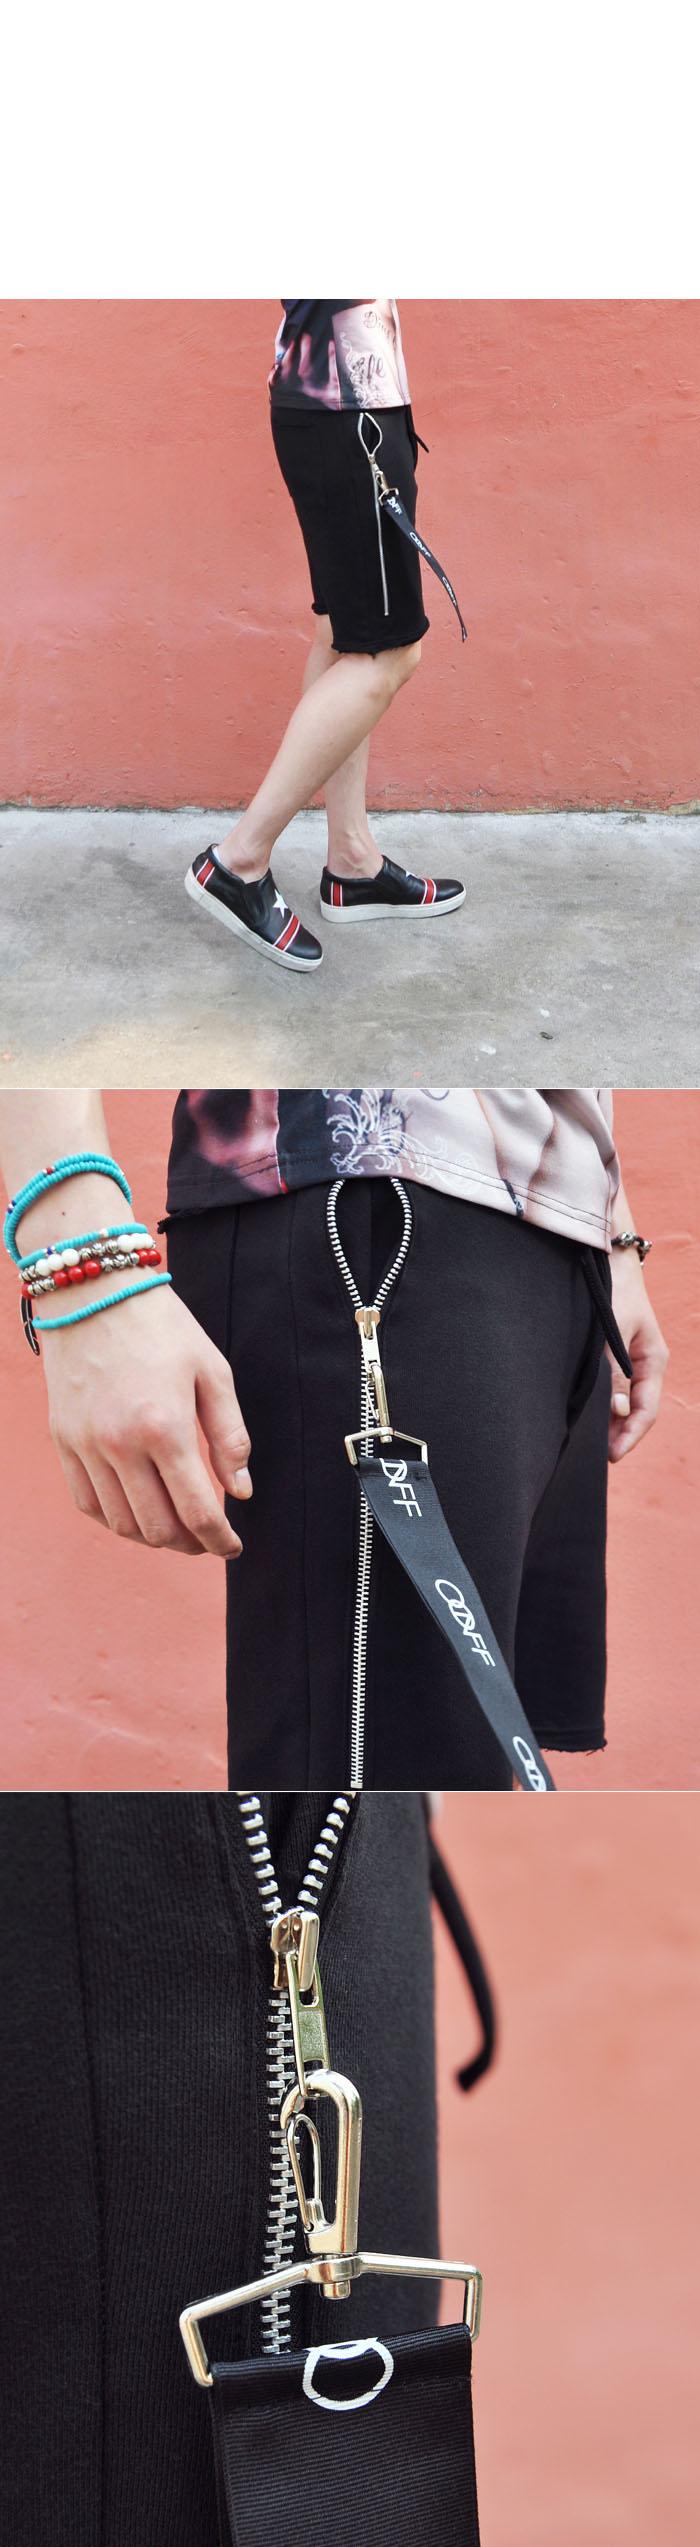 Funky Big Strap Side Zip-Shorts 126 by Guylook.com #men's fashion #guylook…